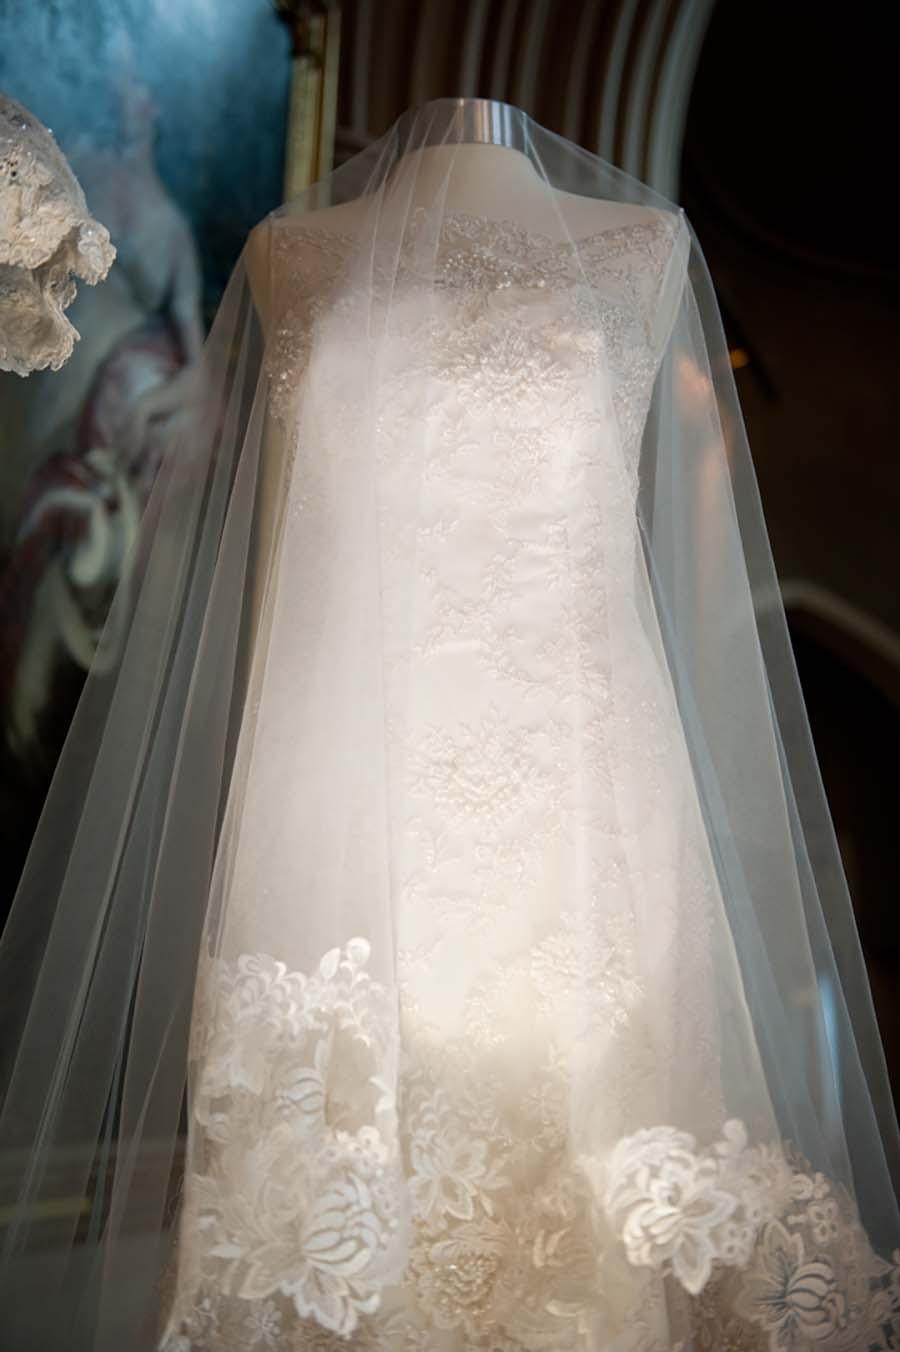 Buckinghams-at-belvoir-castle-wedding-fair-rachael-connerton-photography-19